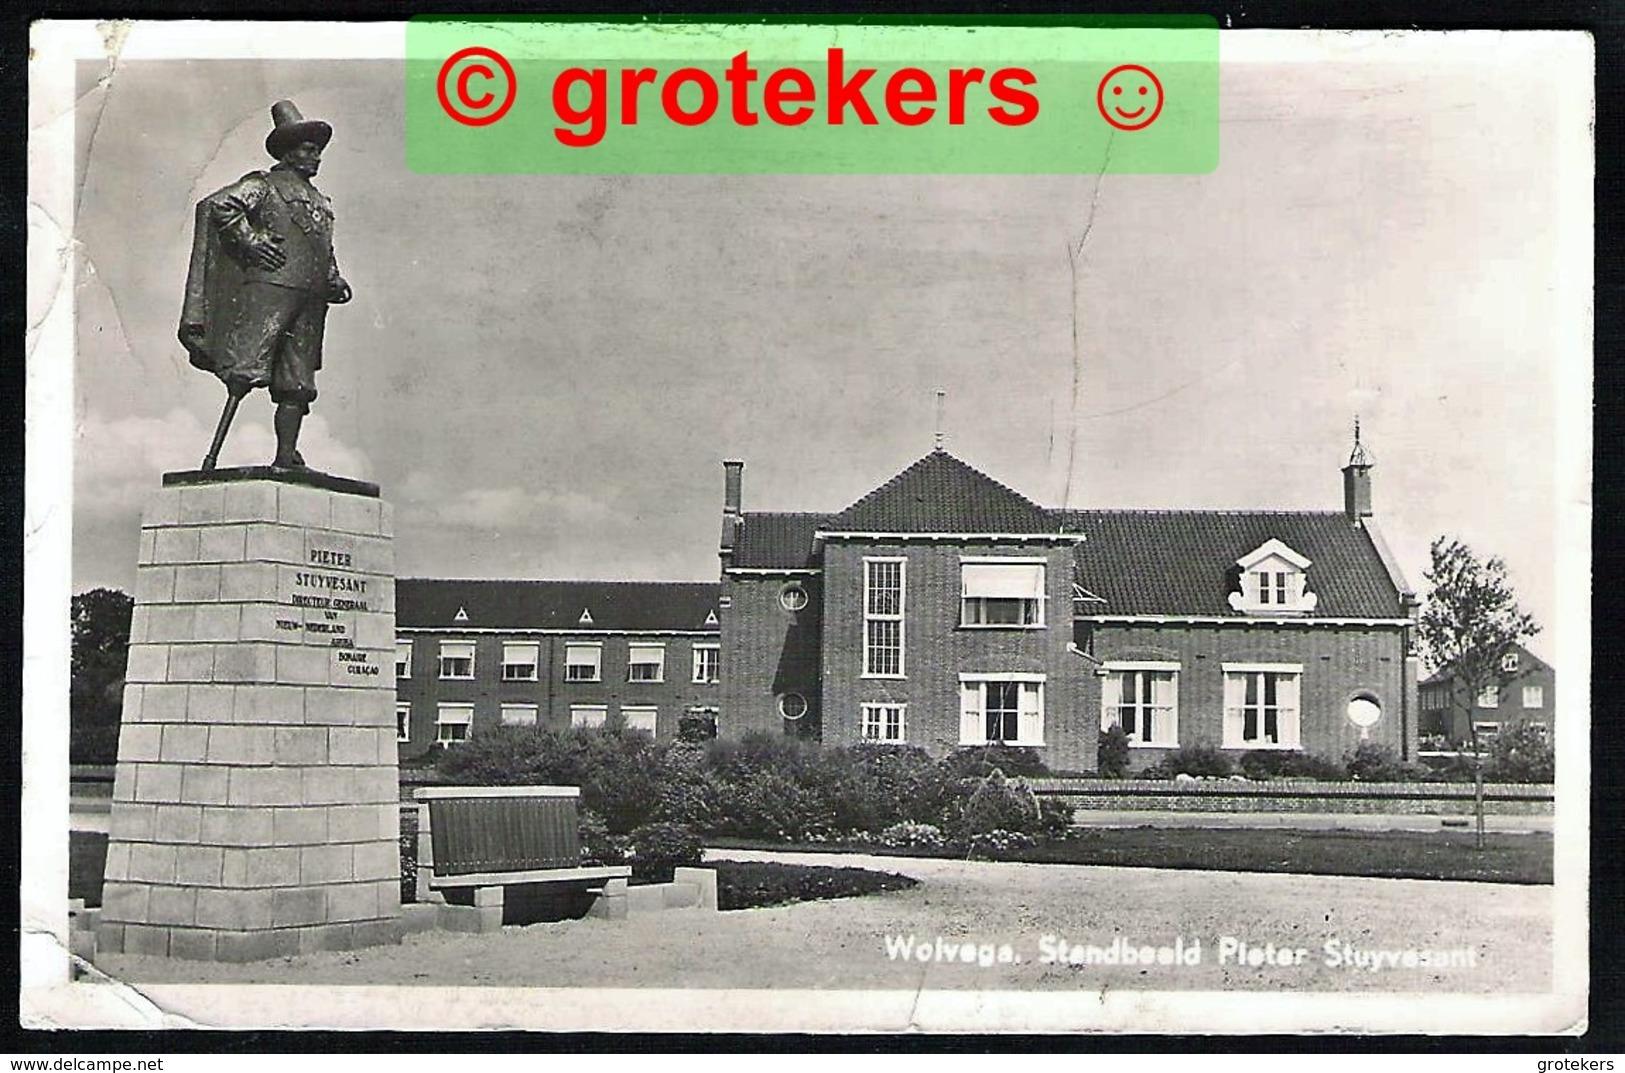 WOLVEGA Standbeeld Pieter Stuyvesant 1957 - Wolvega